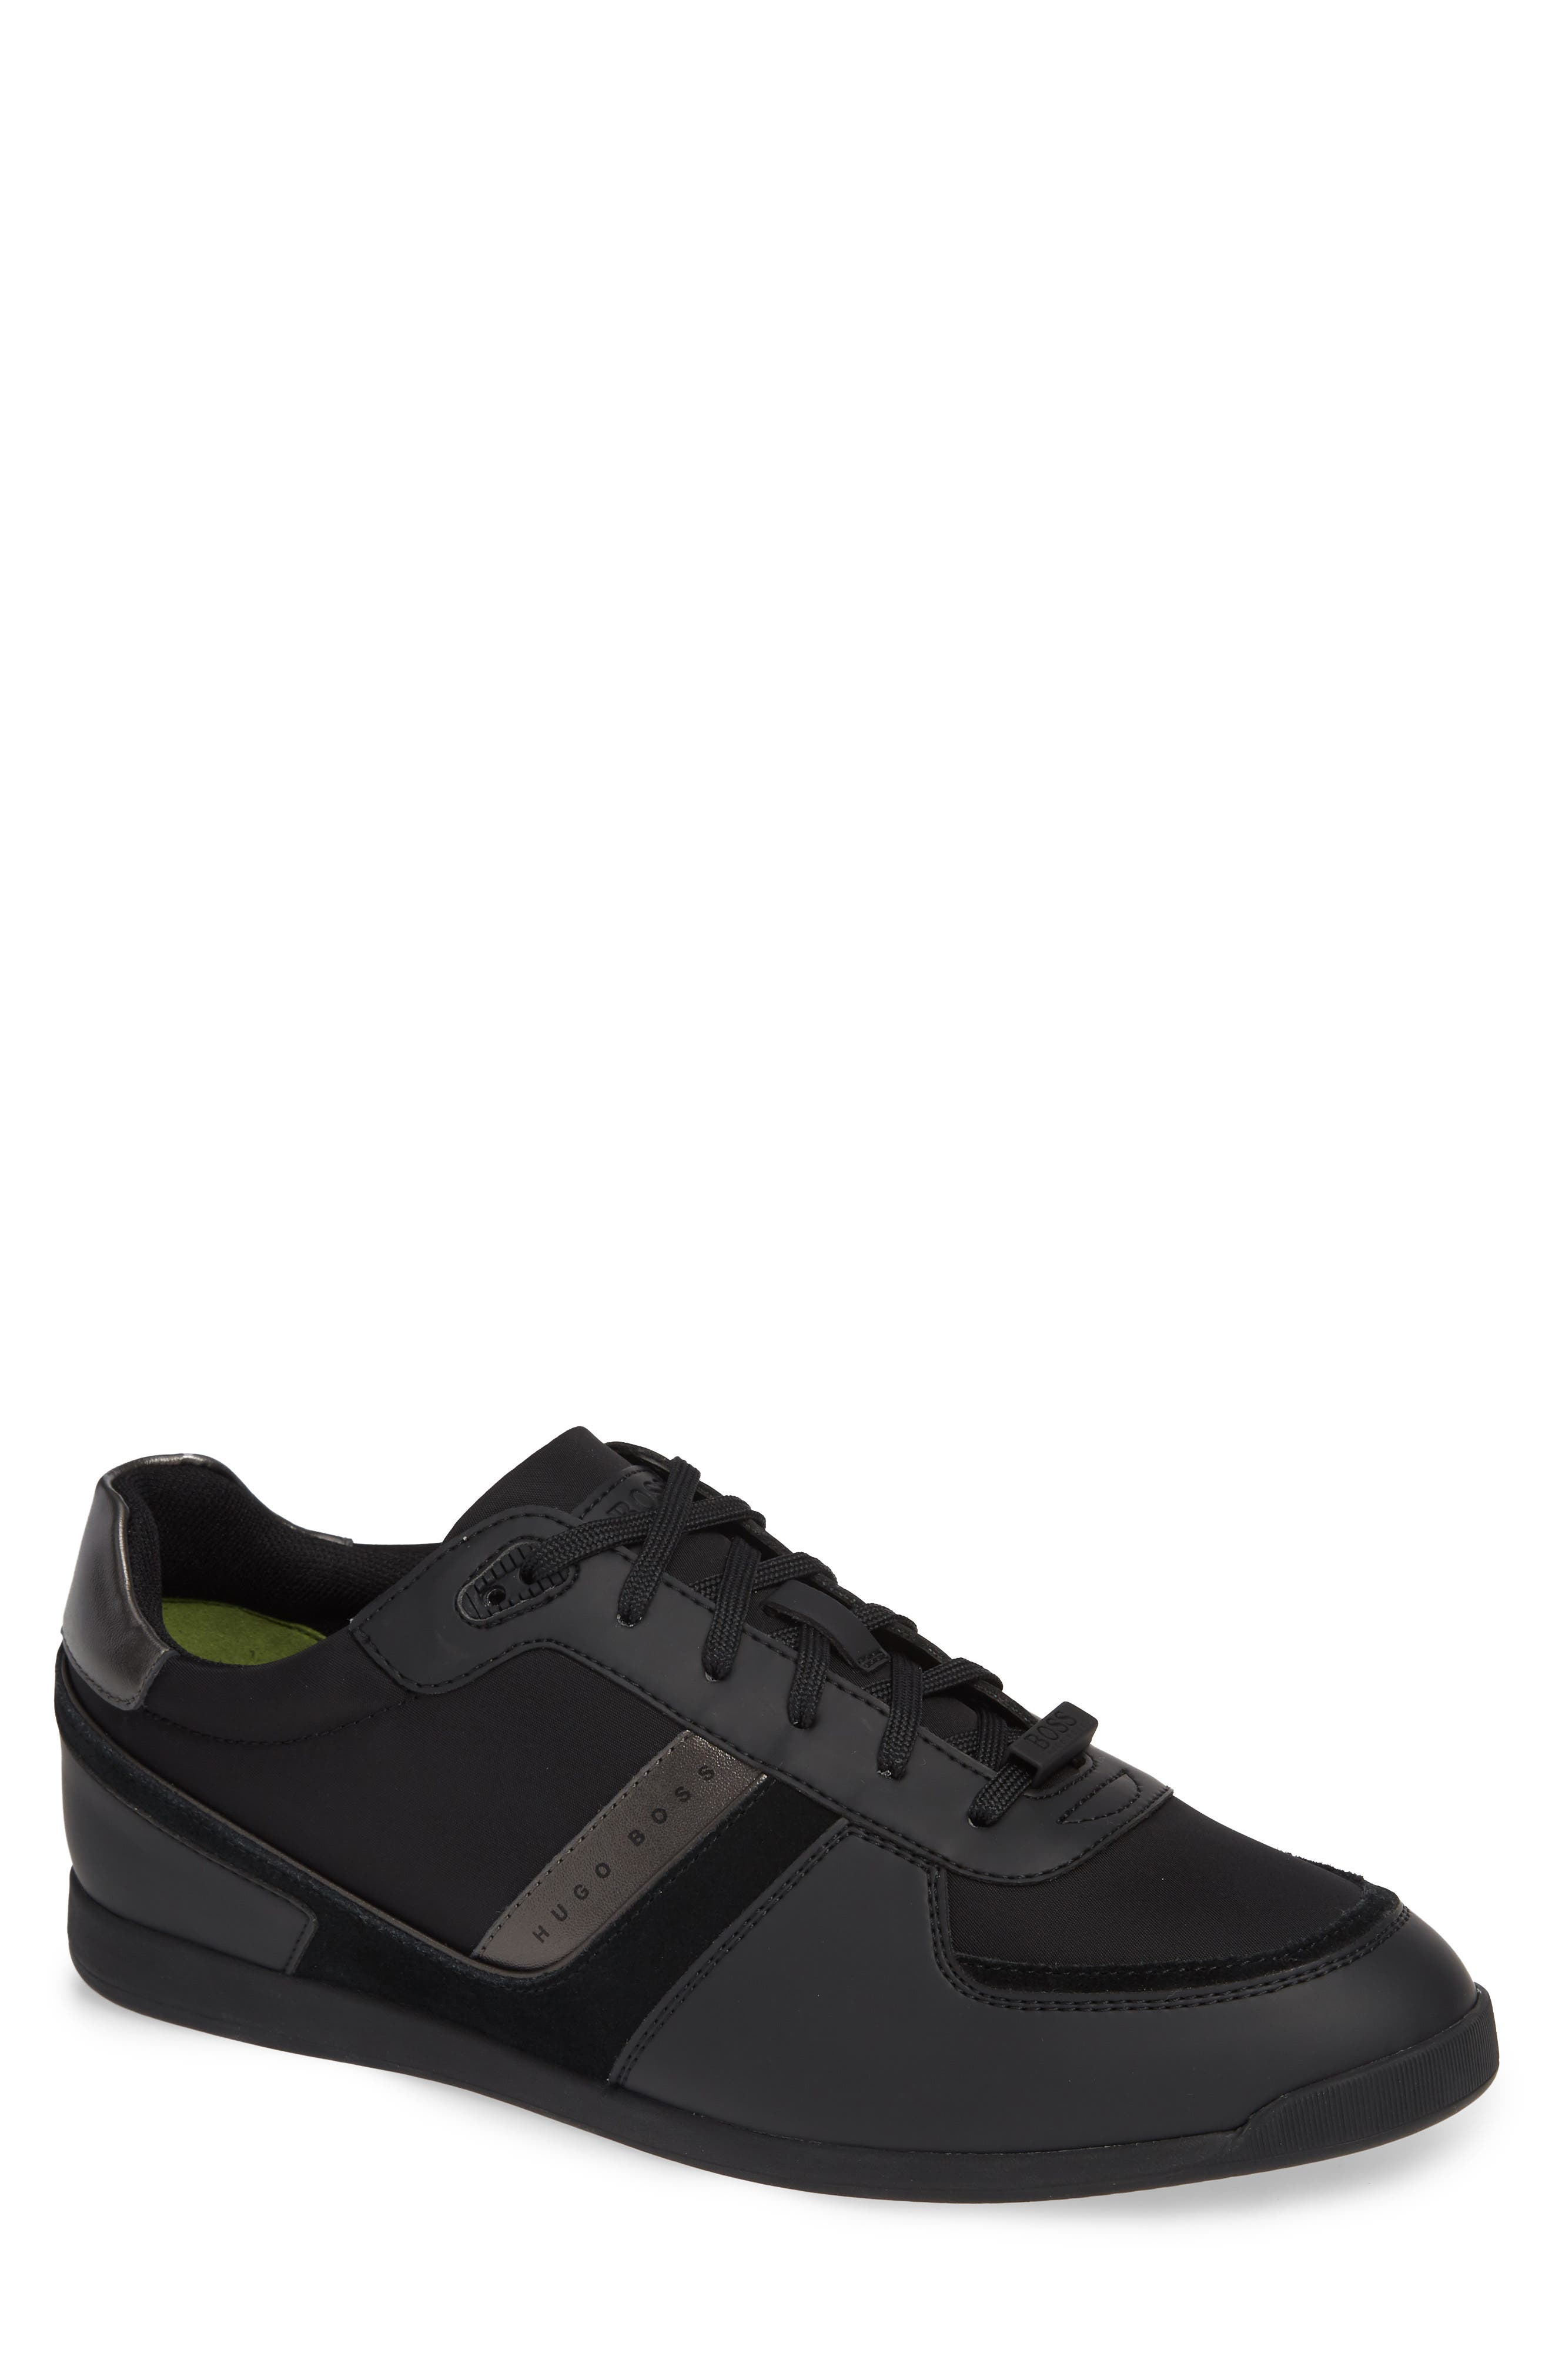 Maze Sneaker,                             Main thumbnail 1, color,                             BLACK